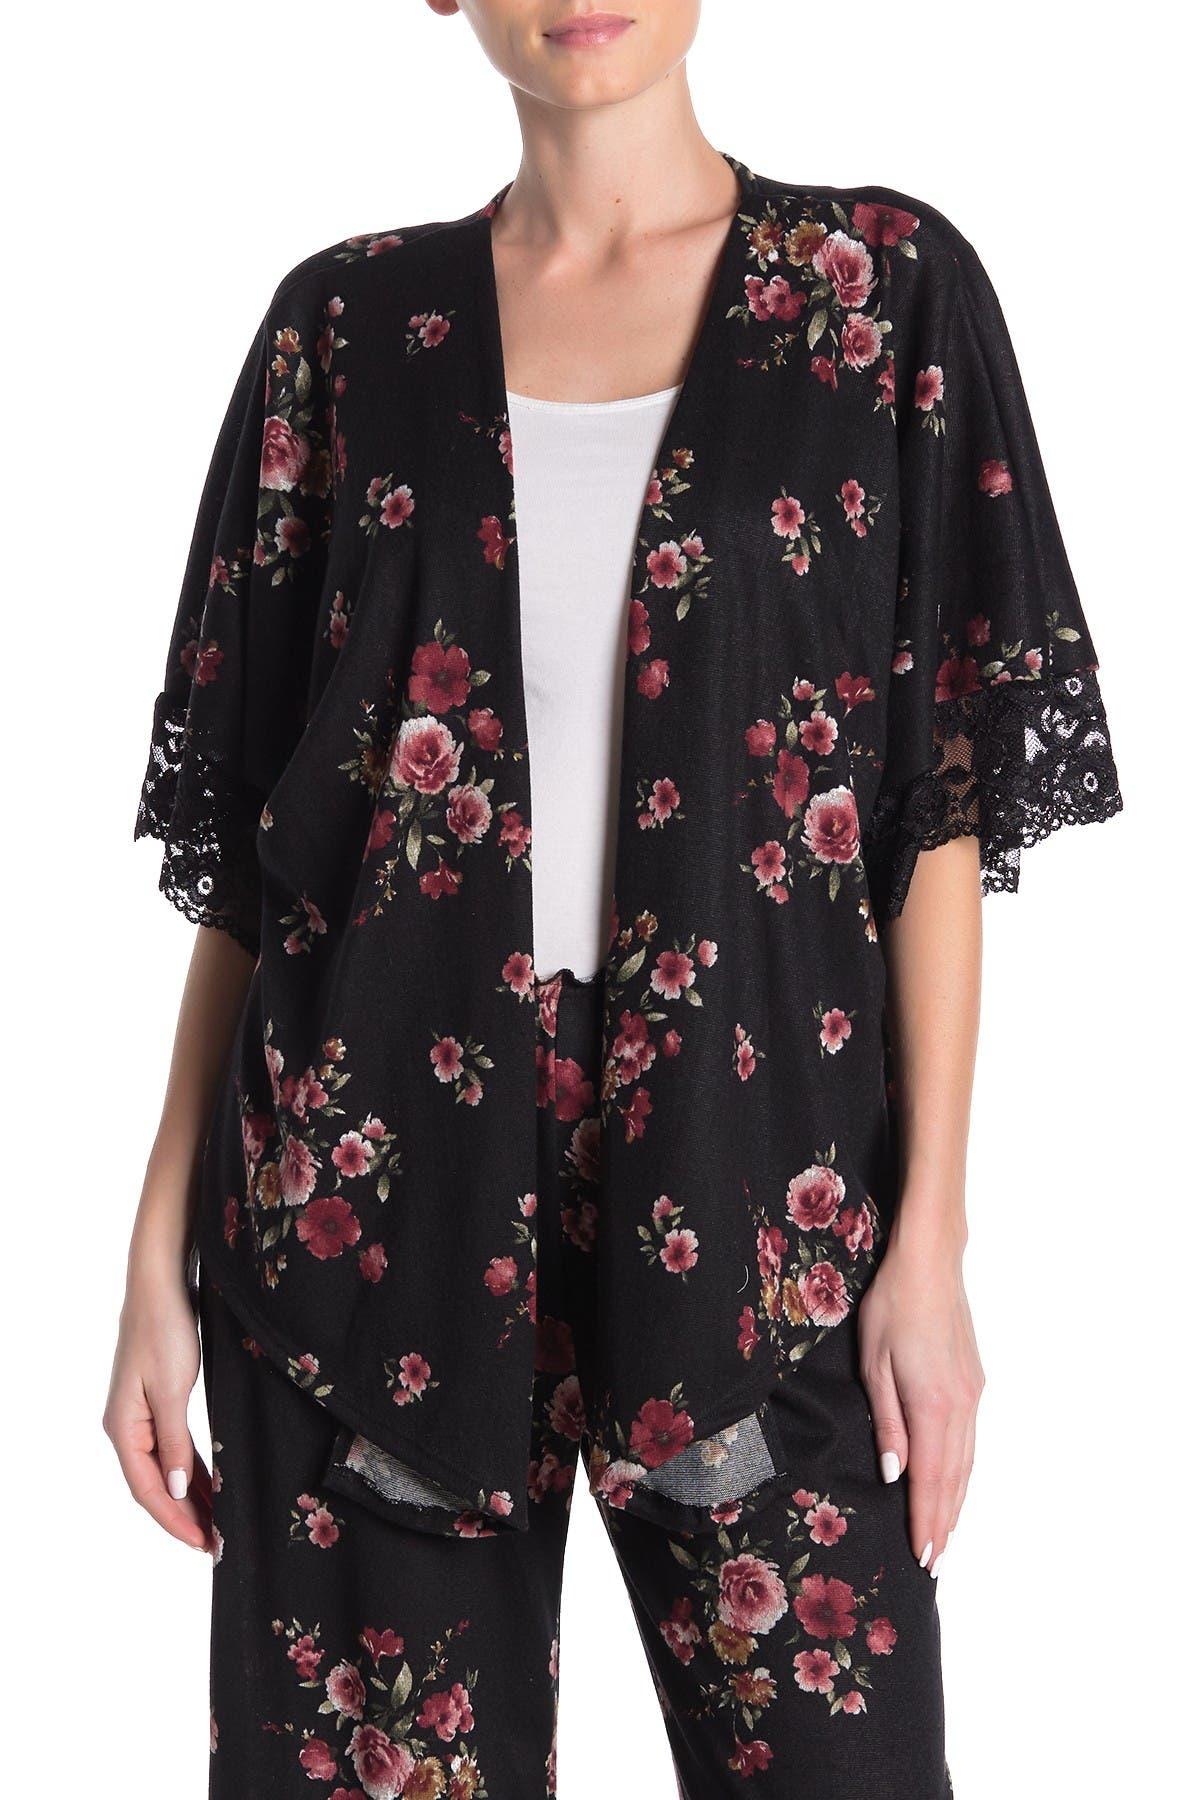 Image of Blue Moon Pink Star Rose Print Lace Trim Kimono